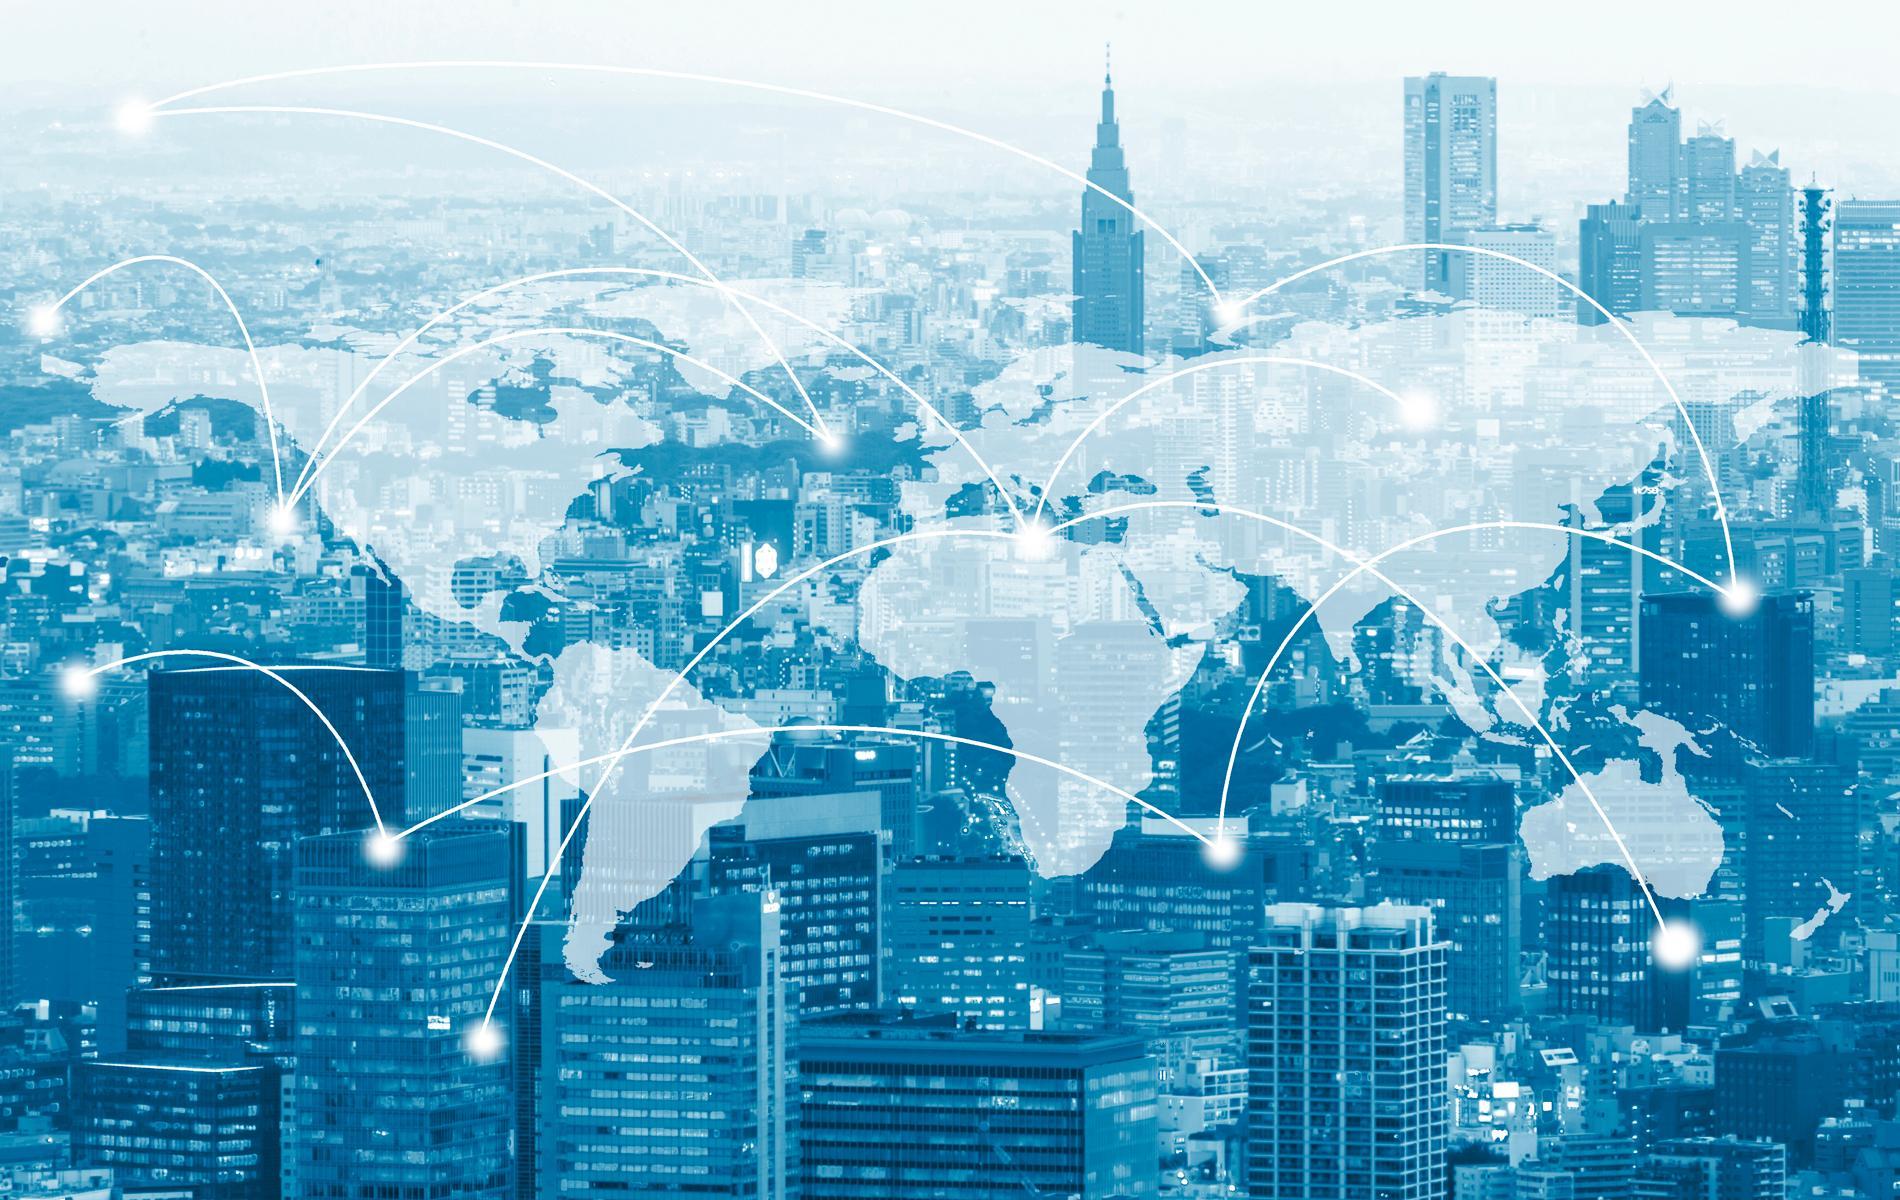 mundo digital tecnologia fintech recurso